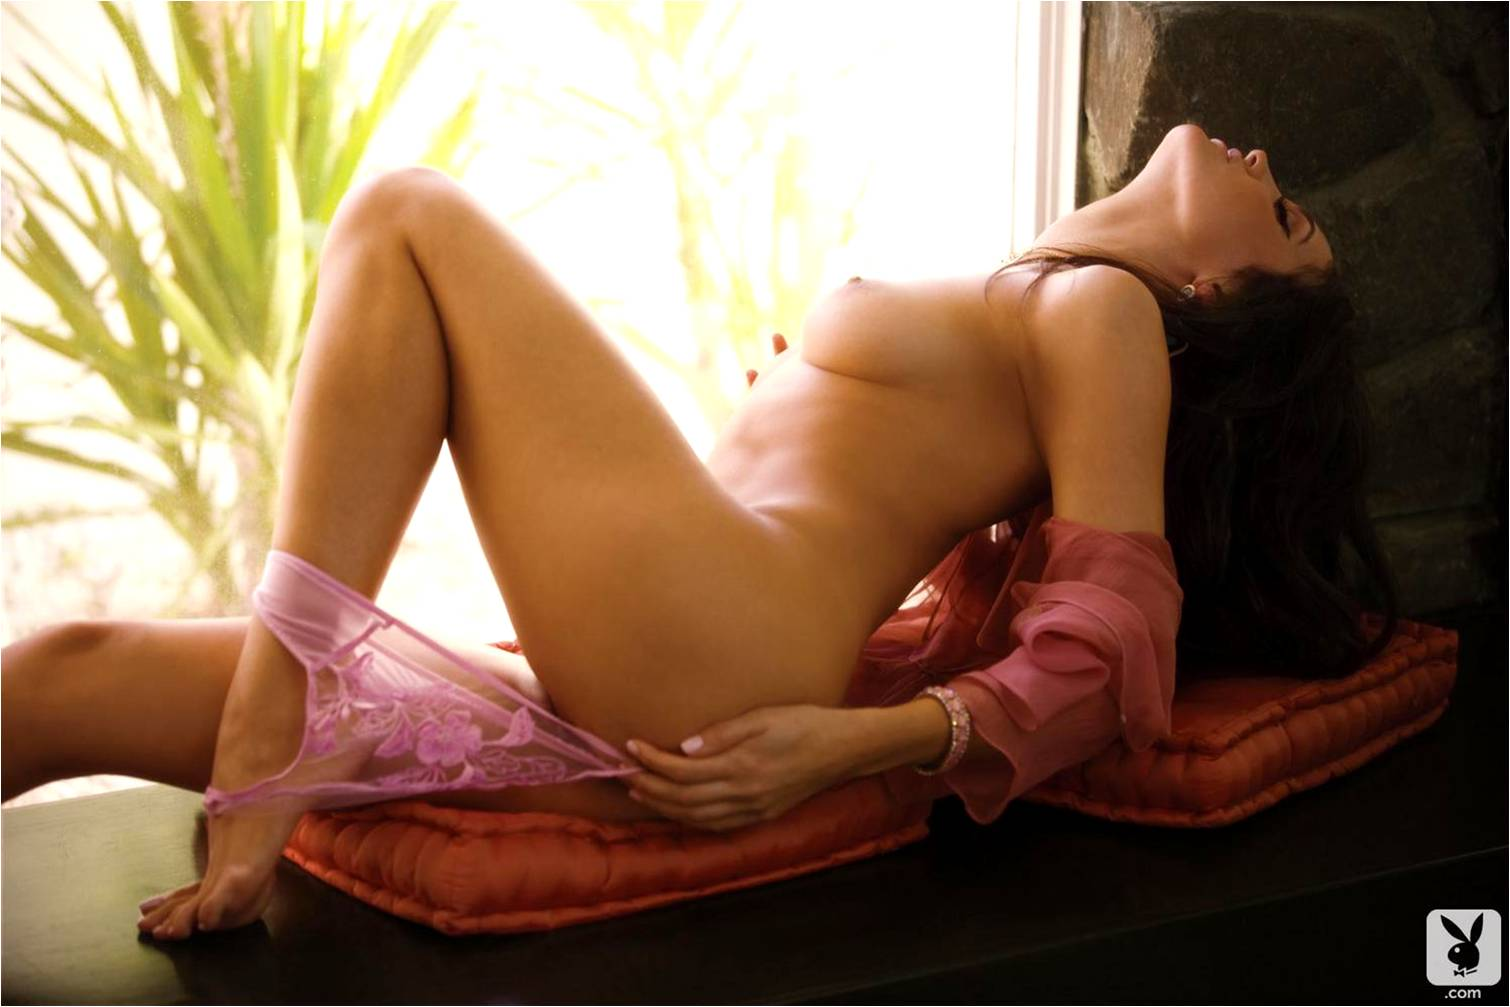 http://1.bp.blogspot.com/-Pozk_PcmFt8/T7V4epzFJMI/AAAAAAAABMw/noII_IpaB10/s1600/Jaclyn+Swedberg+PM07.jpg